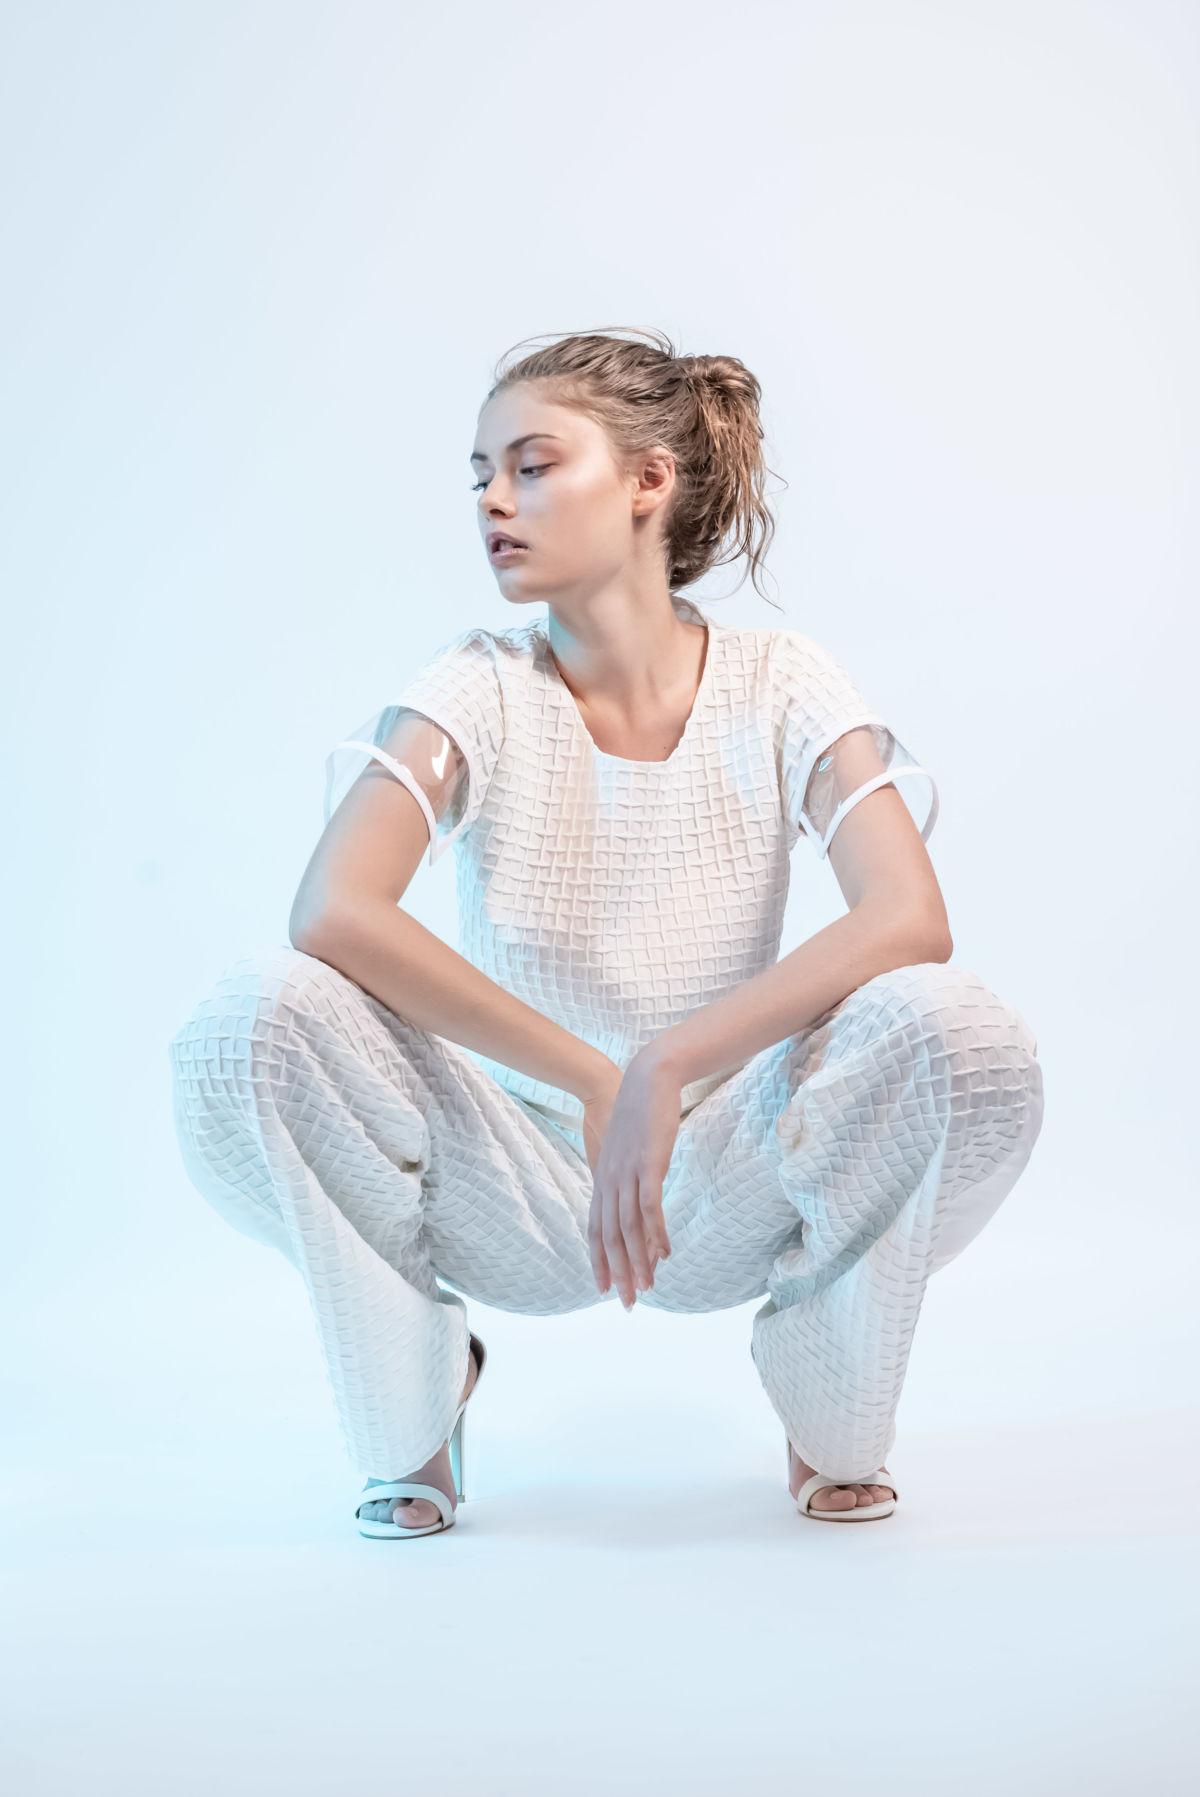 Adeline Ziliox Crystal Skin Lookbook